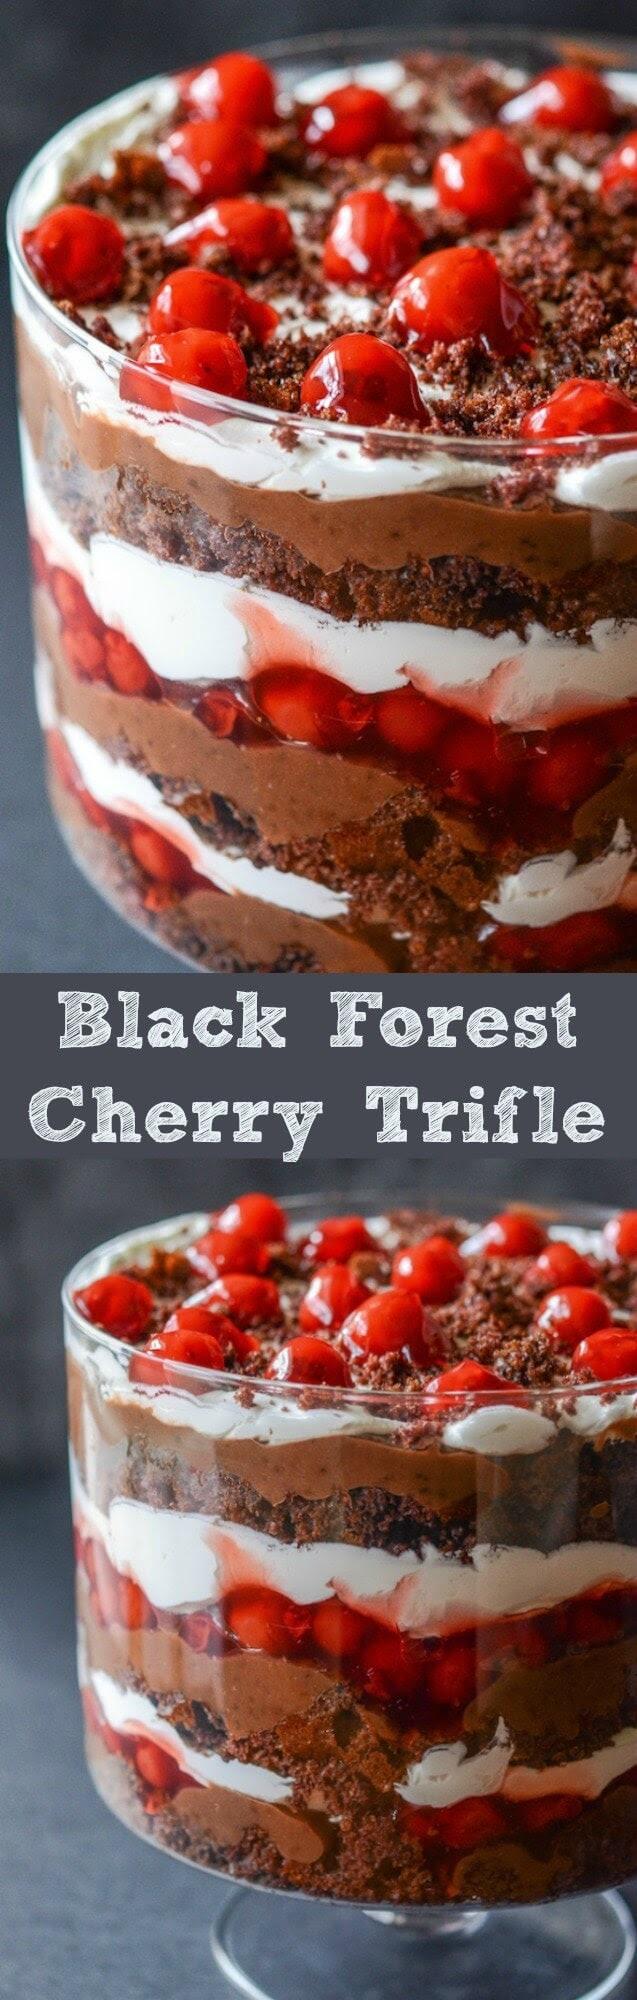 chocolate cherry trifle dessert